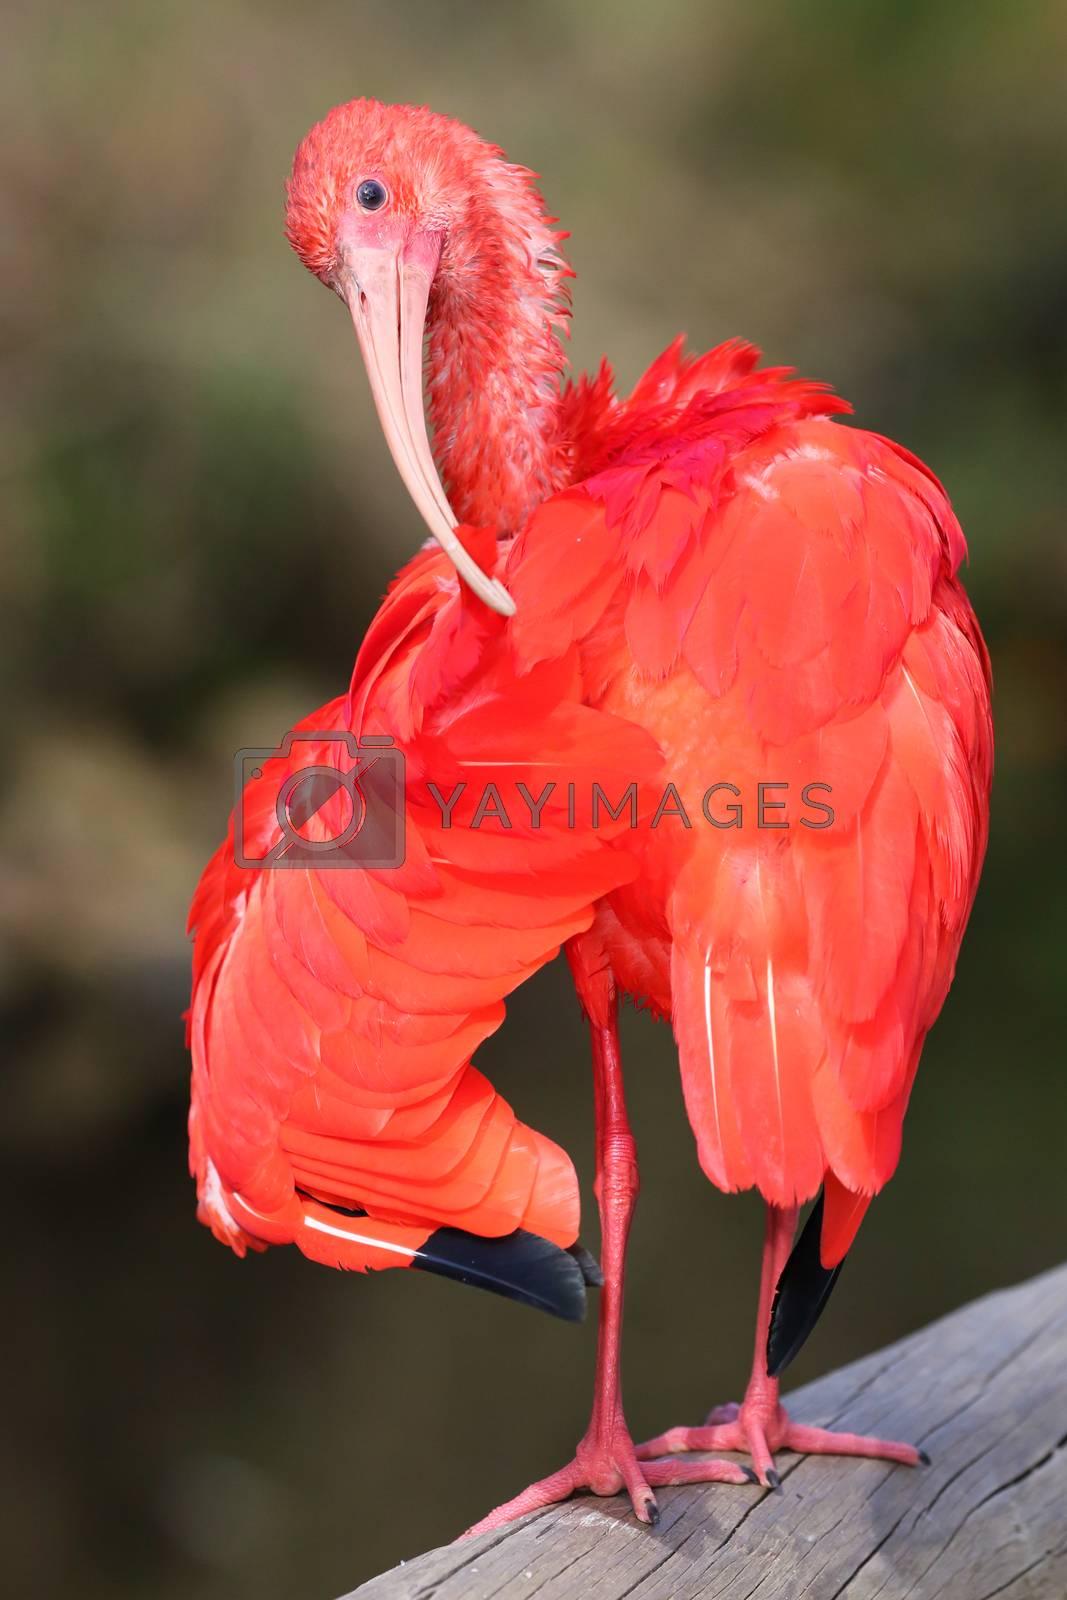 Royalty free image of Scarlet Ibis Bird by fouroaks